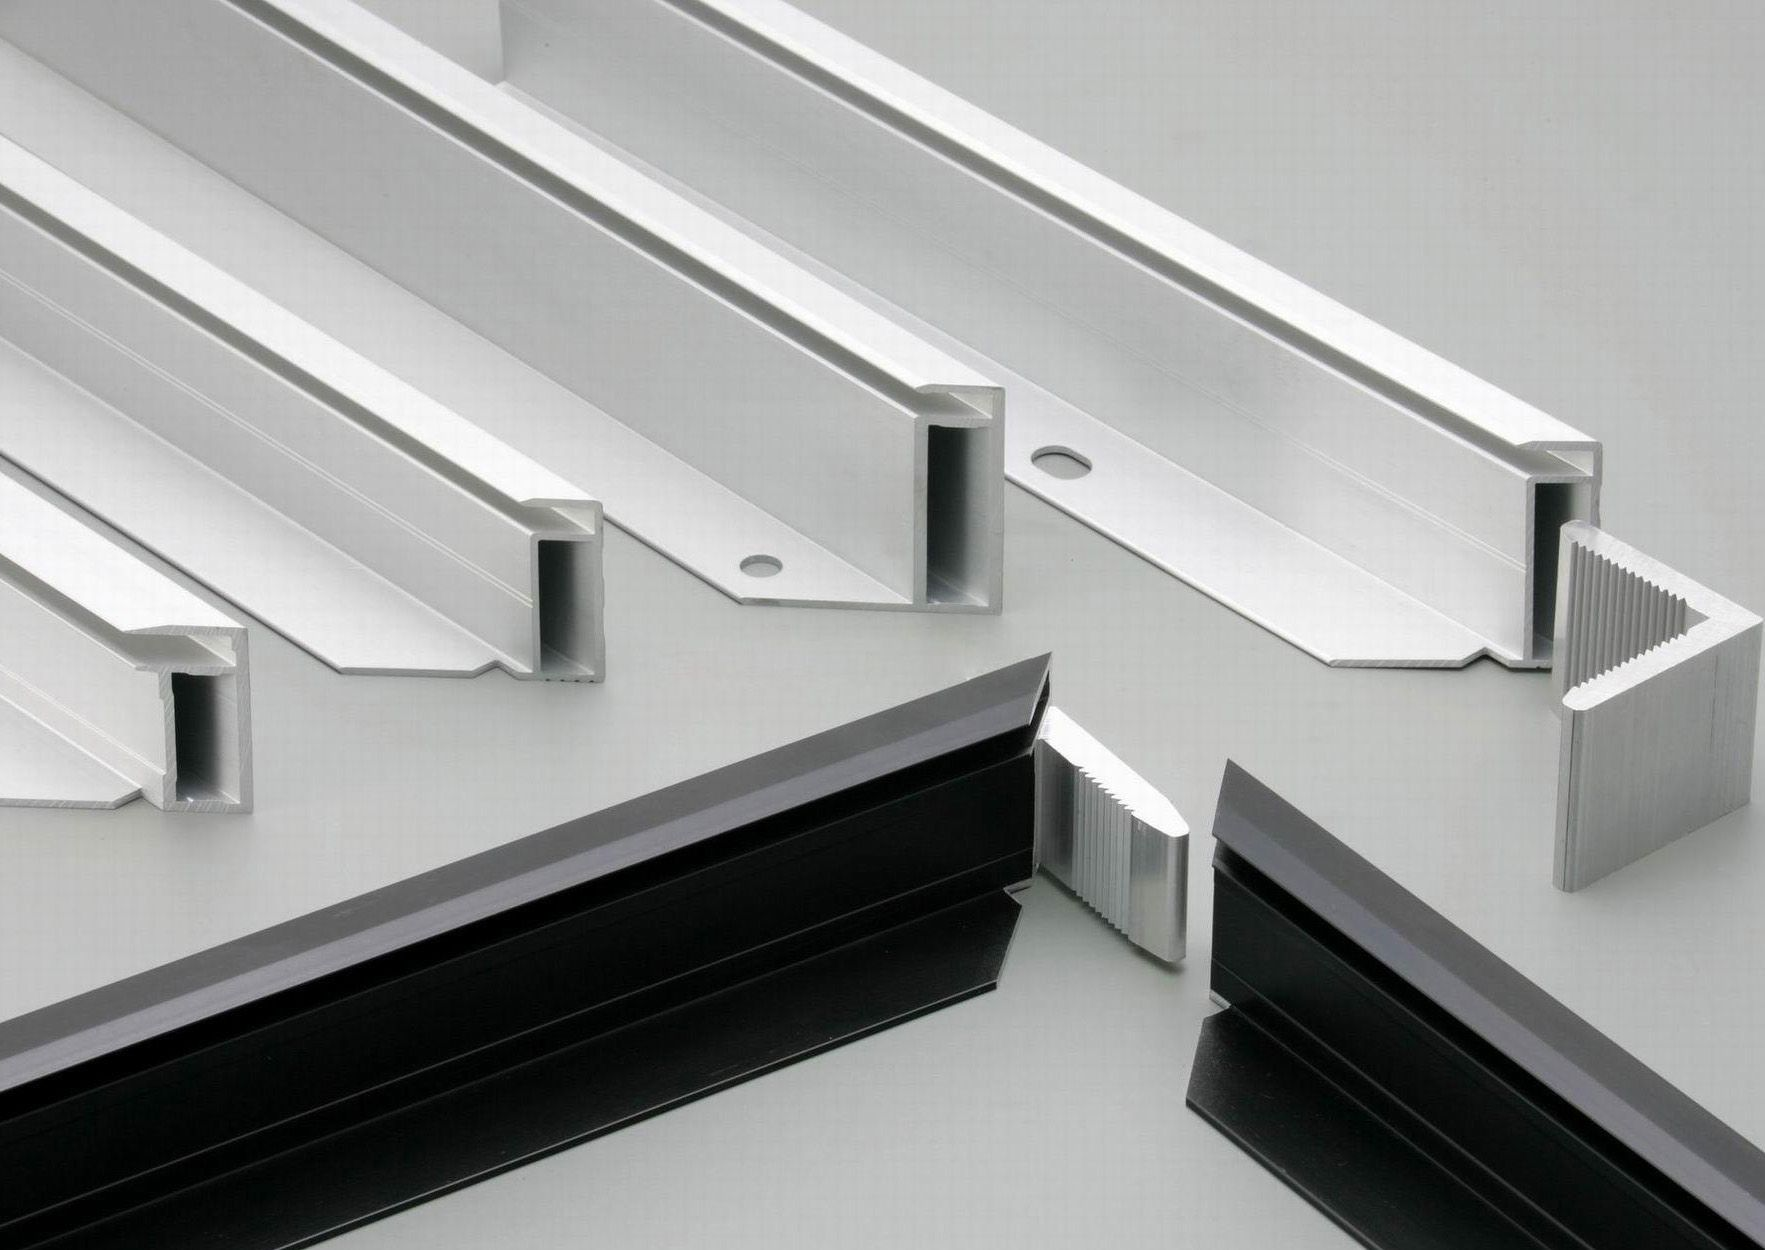 Aluminium Profile Product, Aluminium Alloy Frame For Windows And Doors